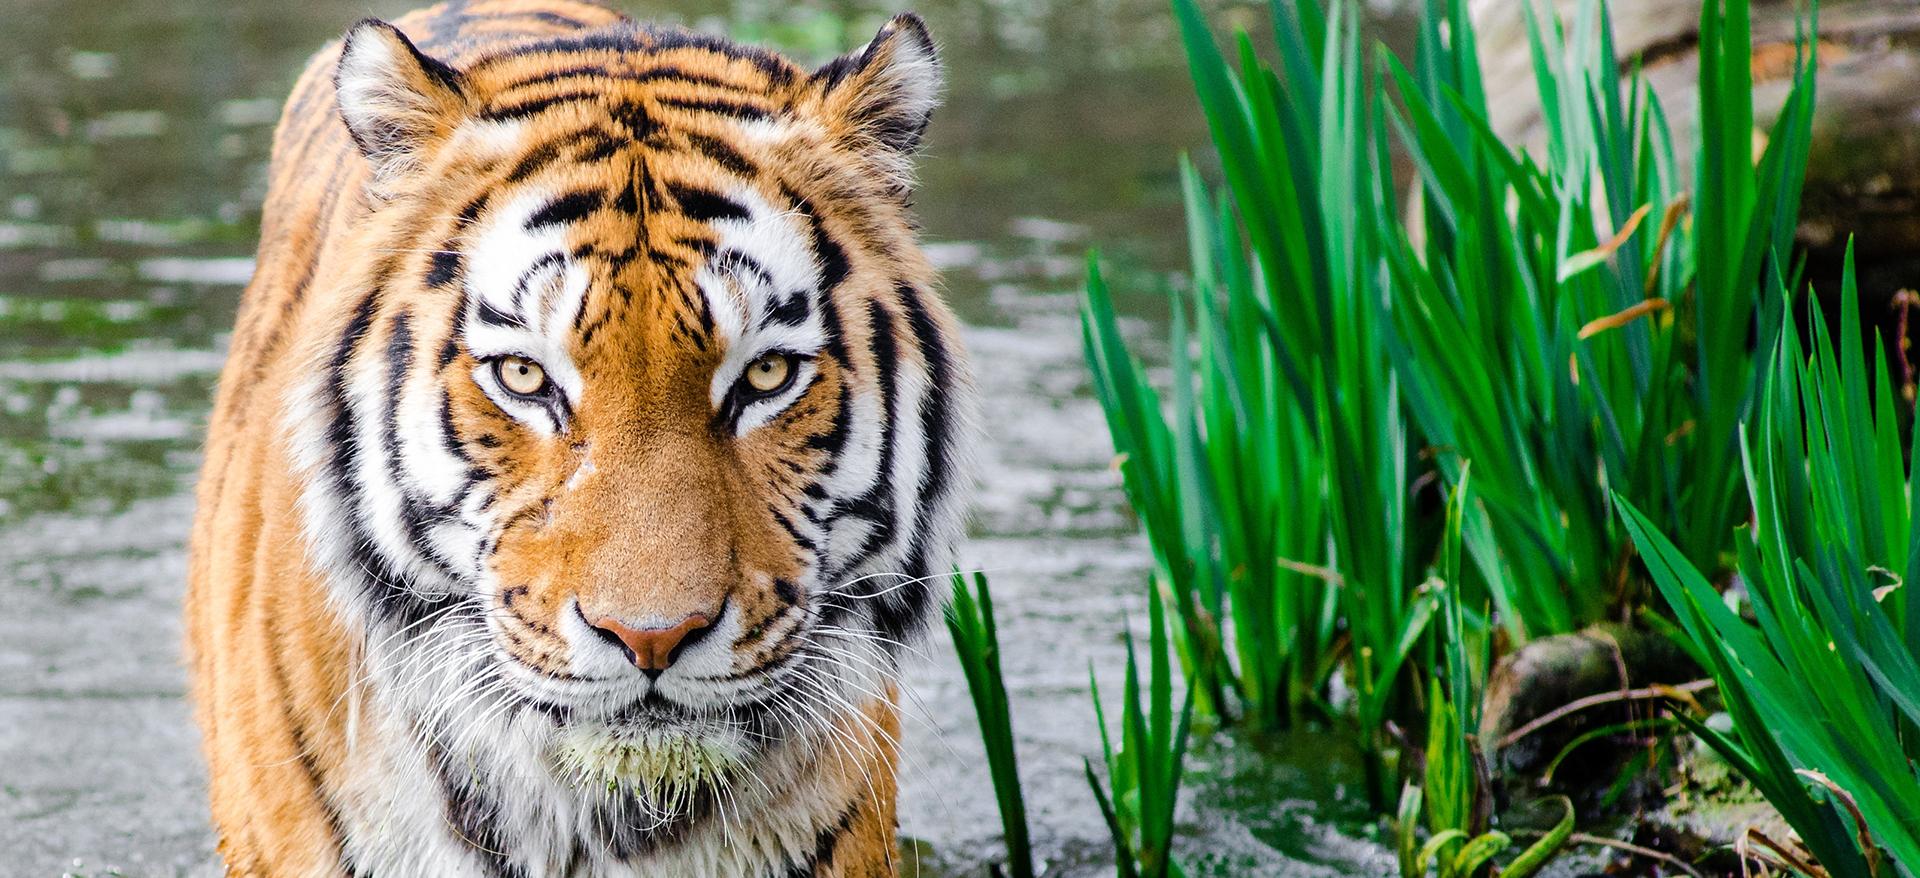 Sara Doati Traduzioni - Il Caso Tiger King